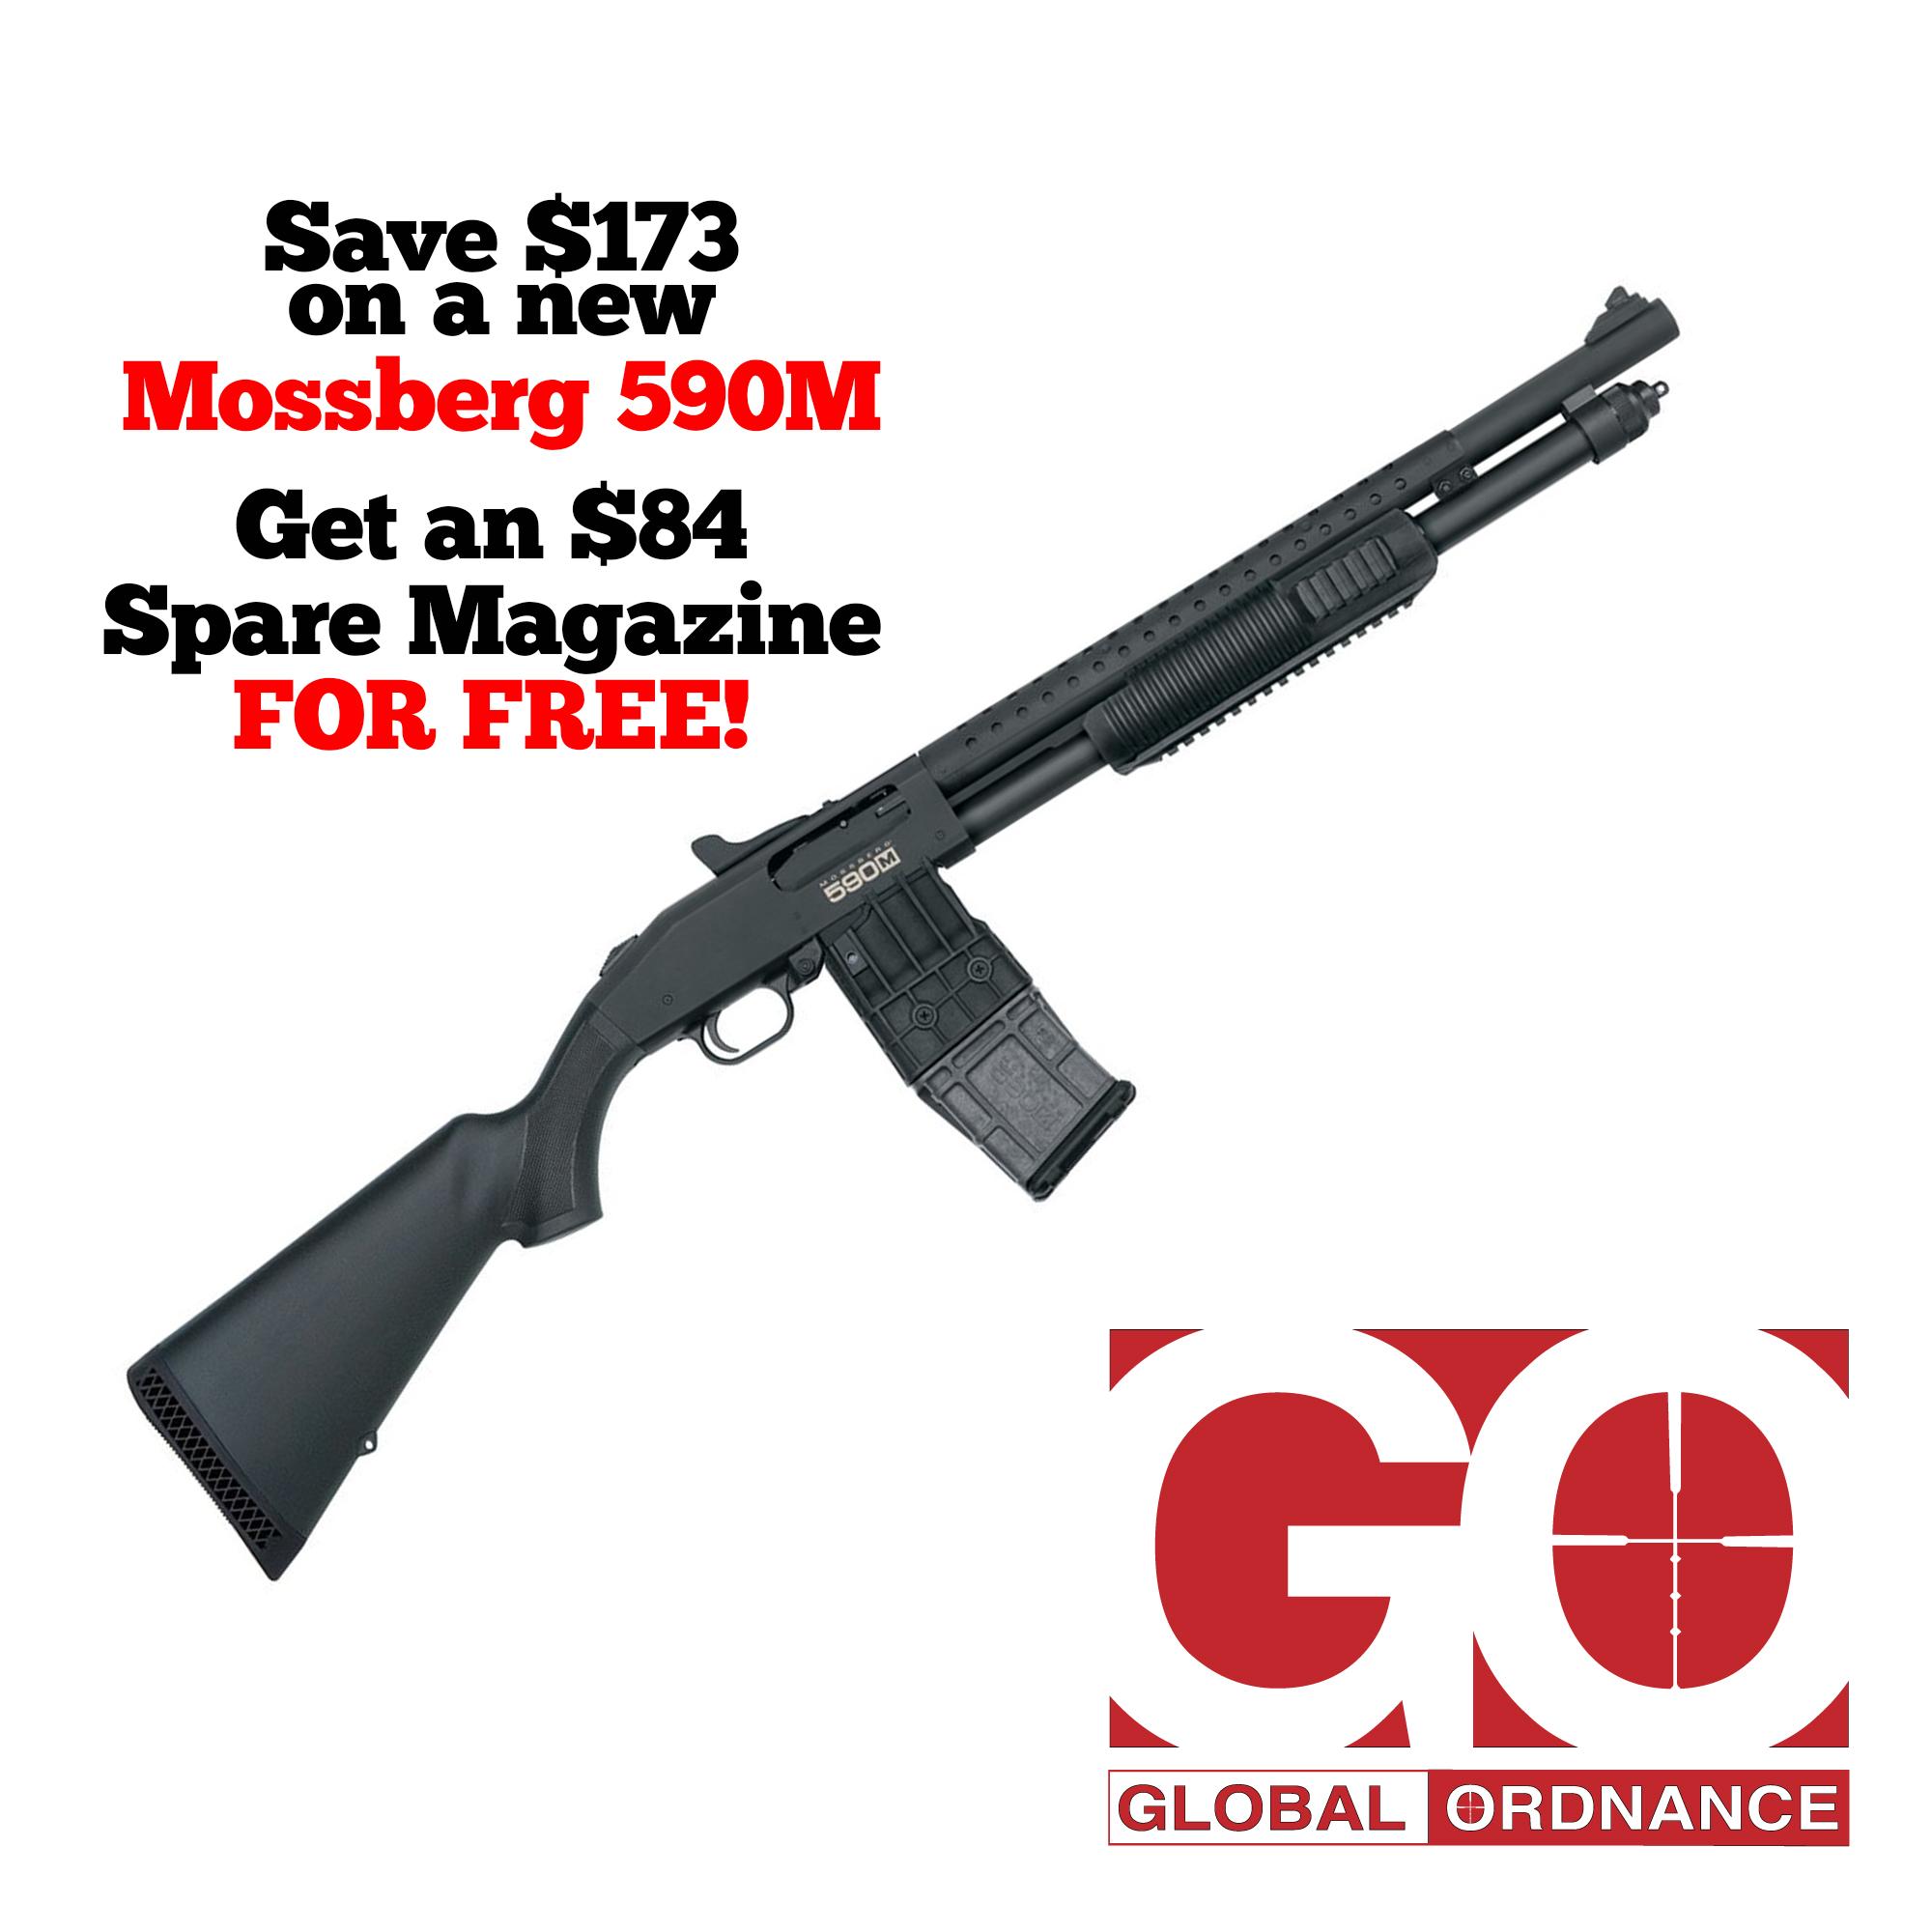 Mossberg 590M, Mag-Fed, Pump Action Shotgun, 18 5